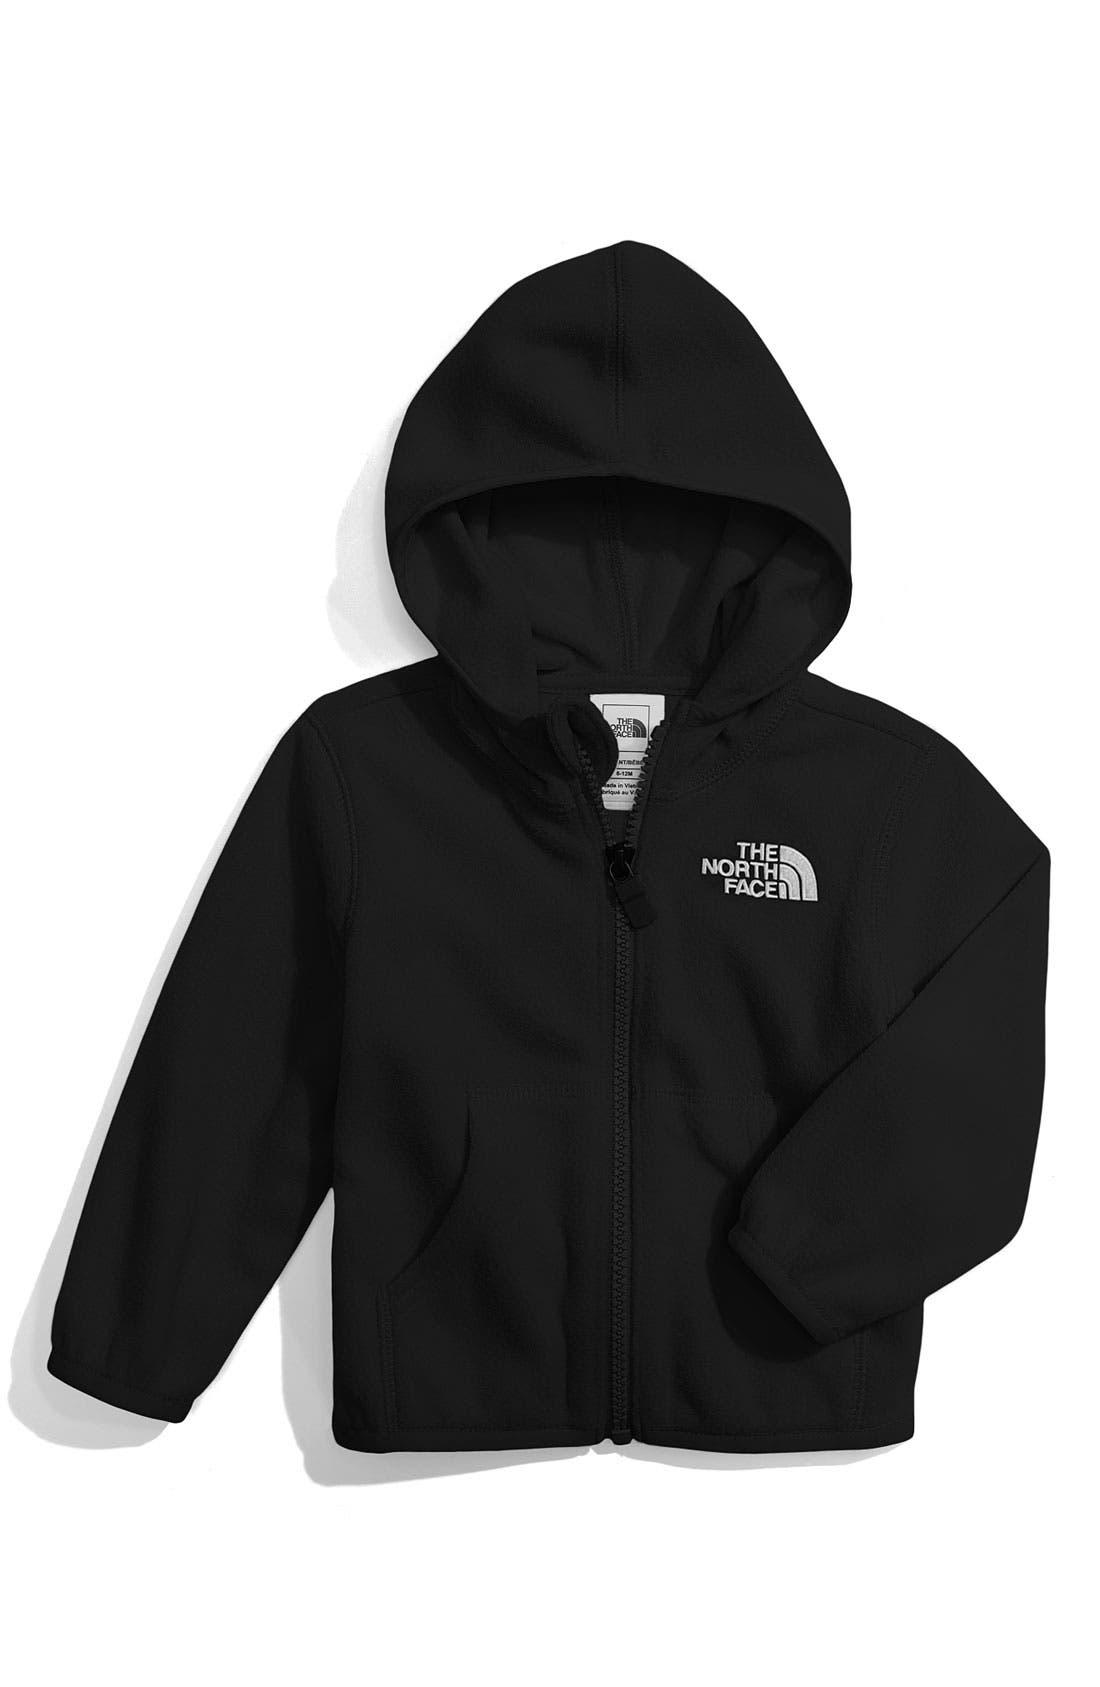 Main Image - The North Face 'Glacier' Fleece Jacket (Infant)